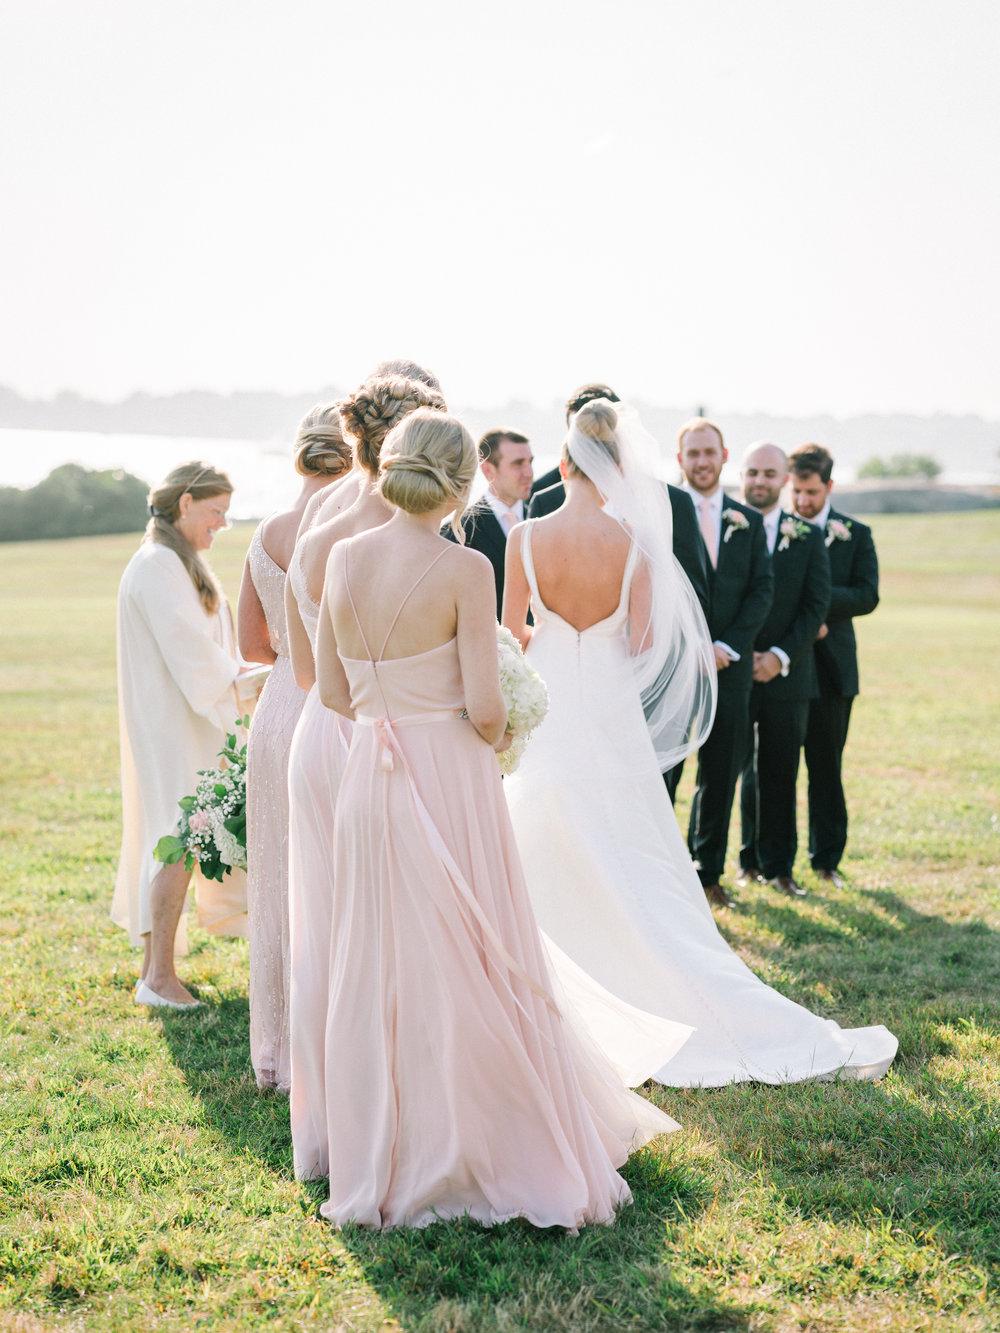 hannah-cochran-photography-bob-and-hayley-wedding-79.jpg